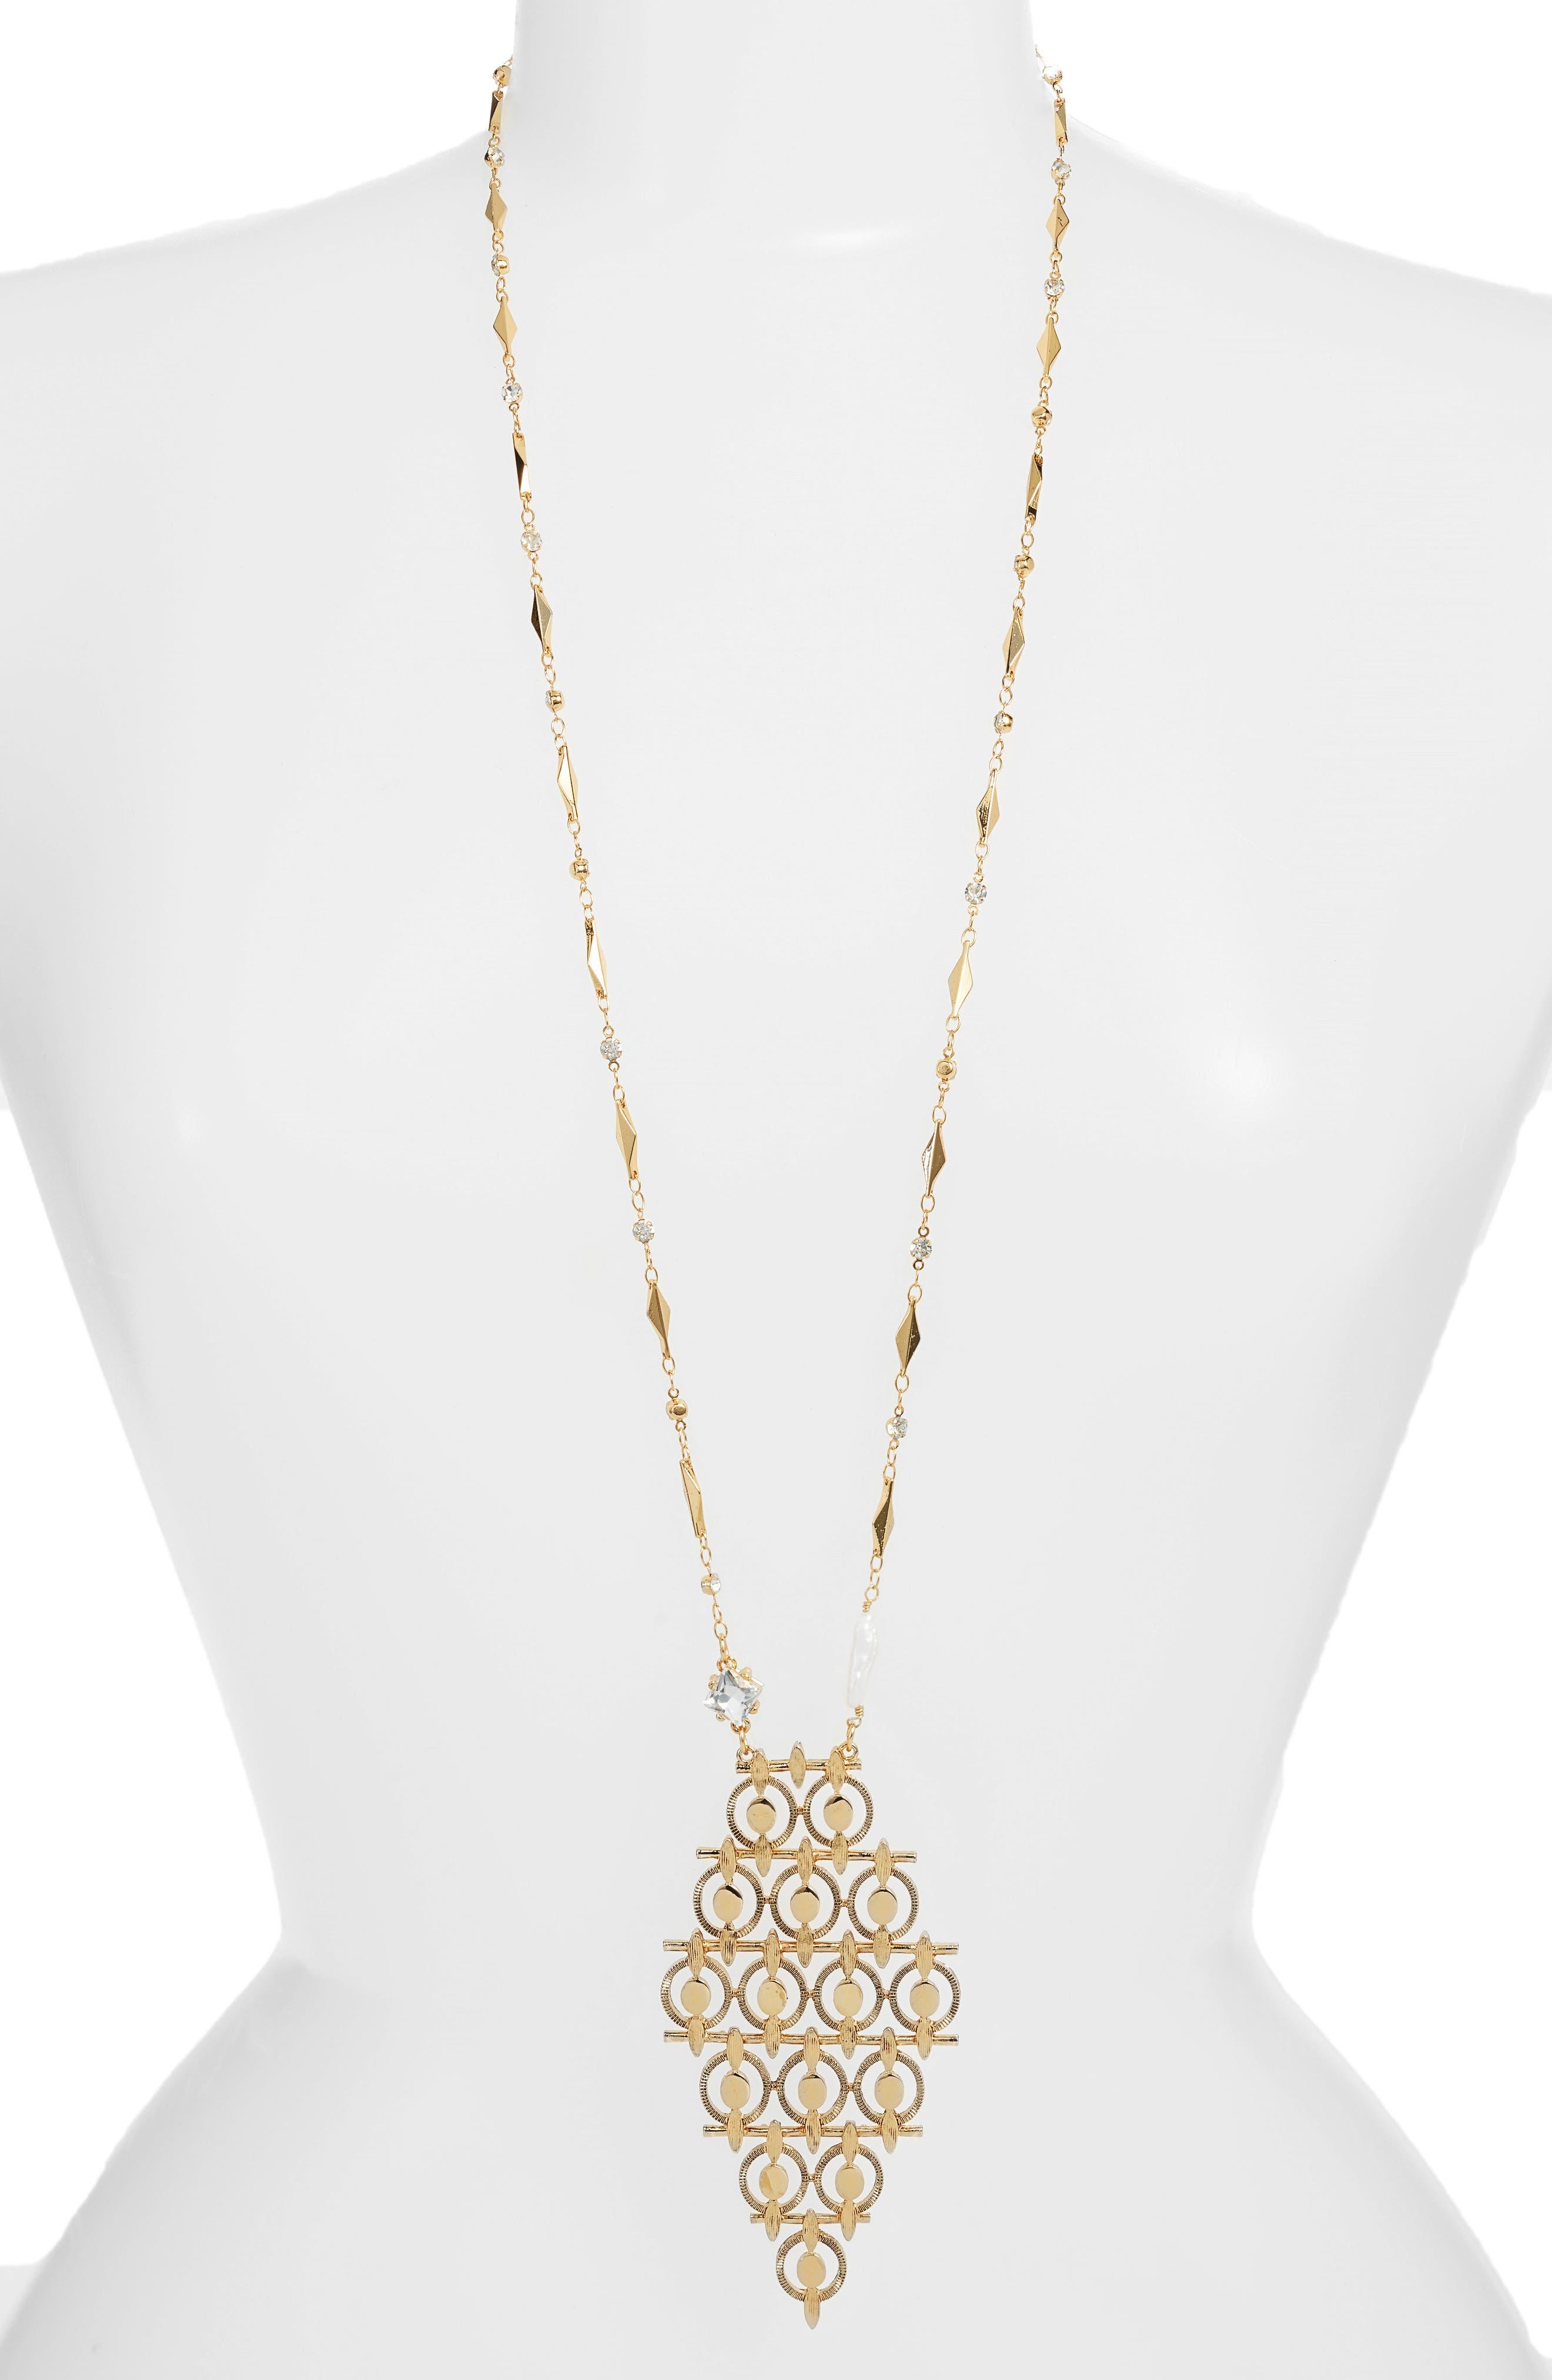 Badgley Mischka Diamond Shaped Long Pendant Necklace